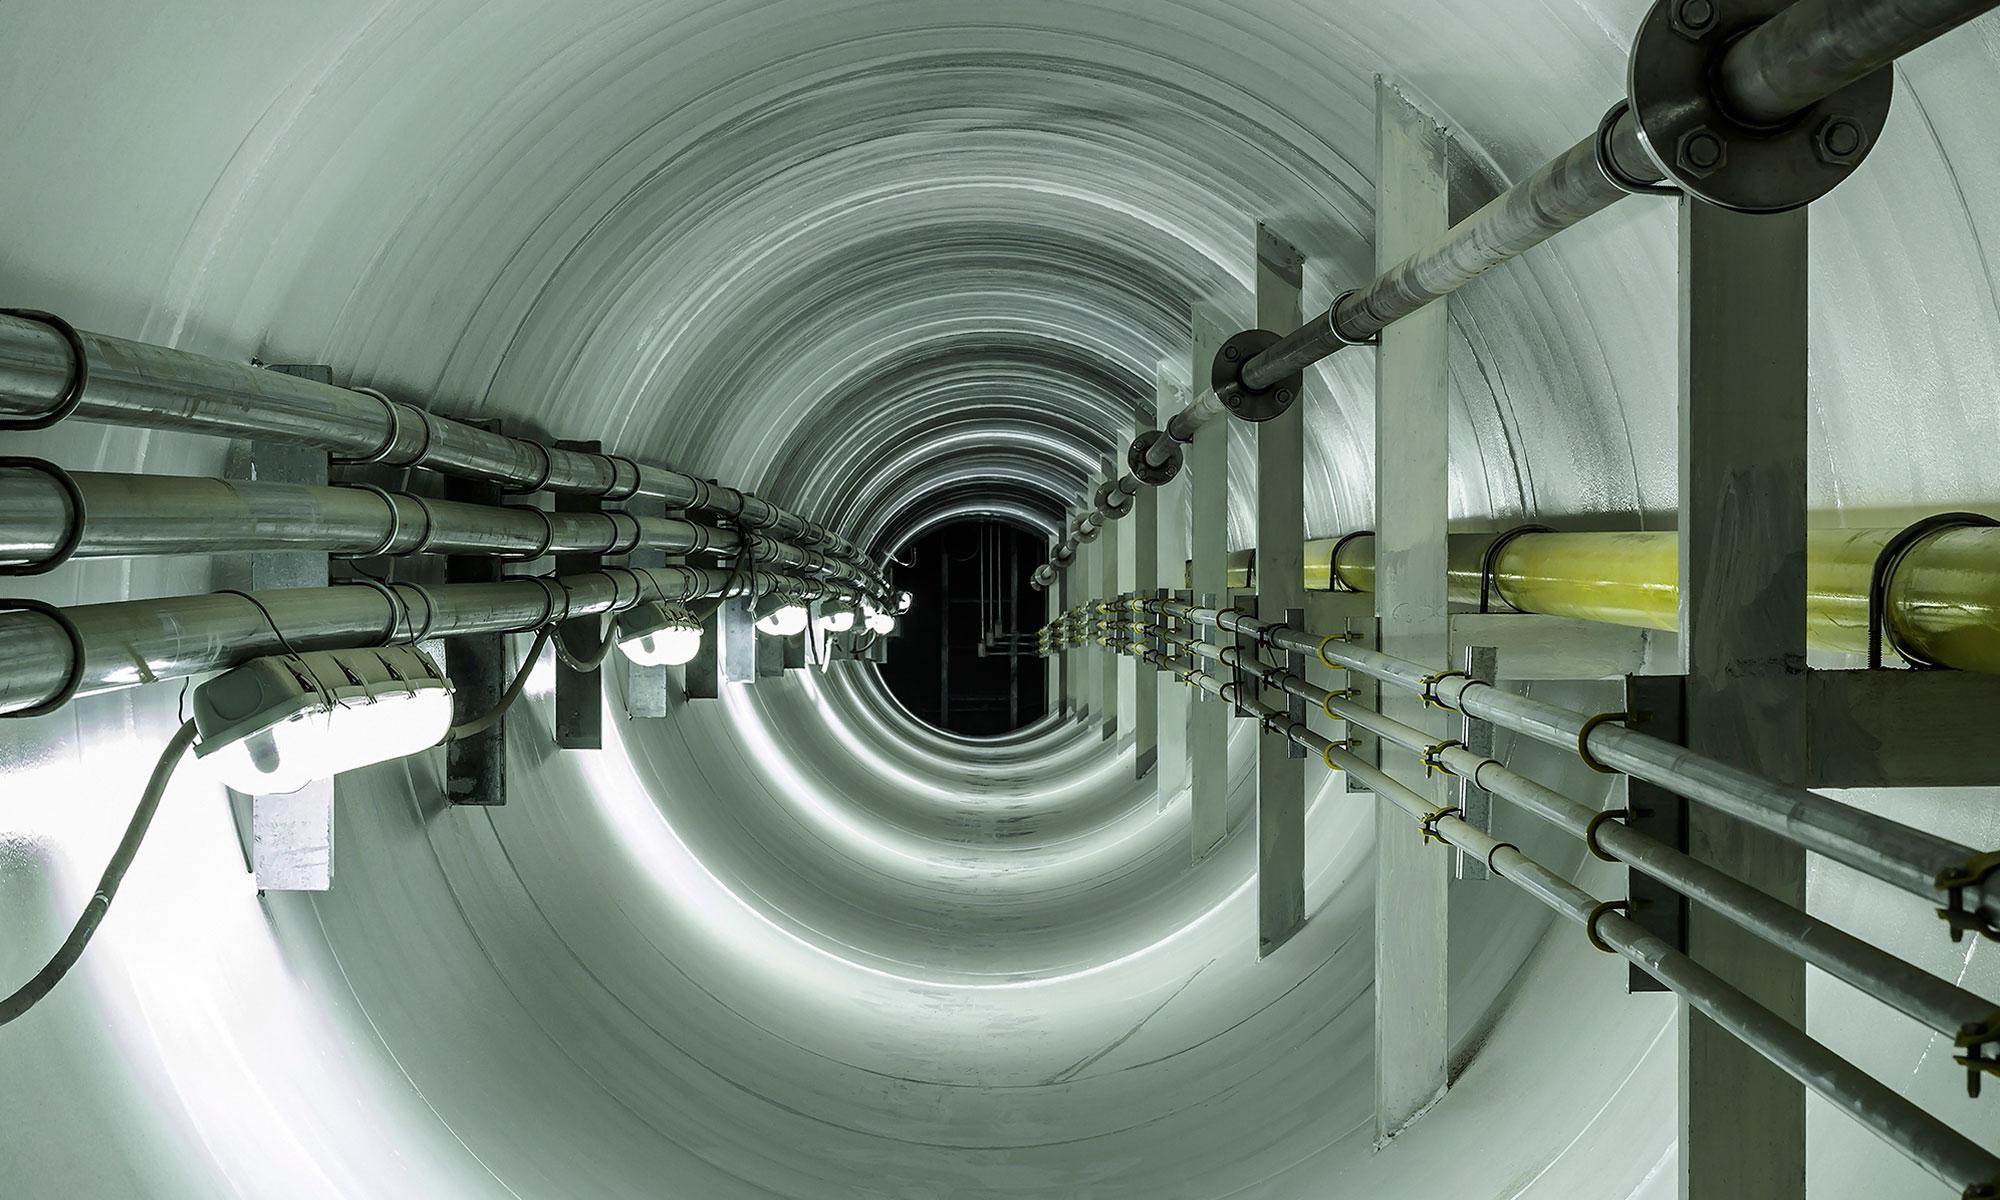 Tunele kablowe